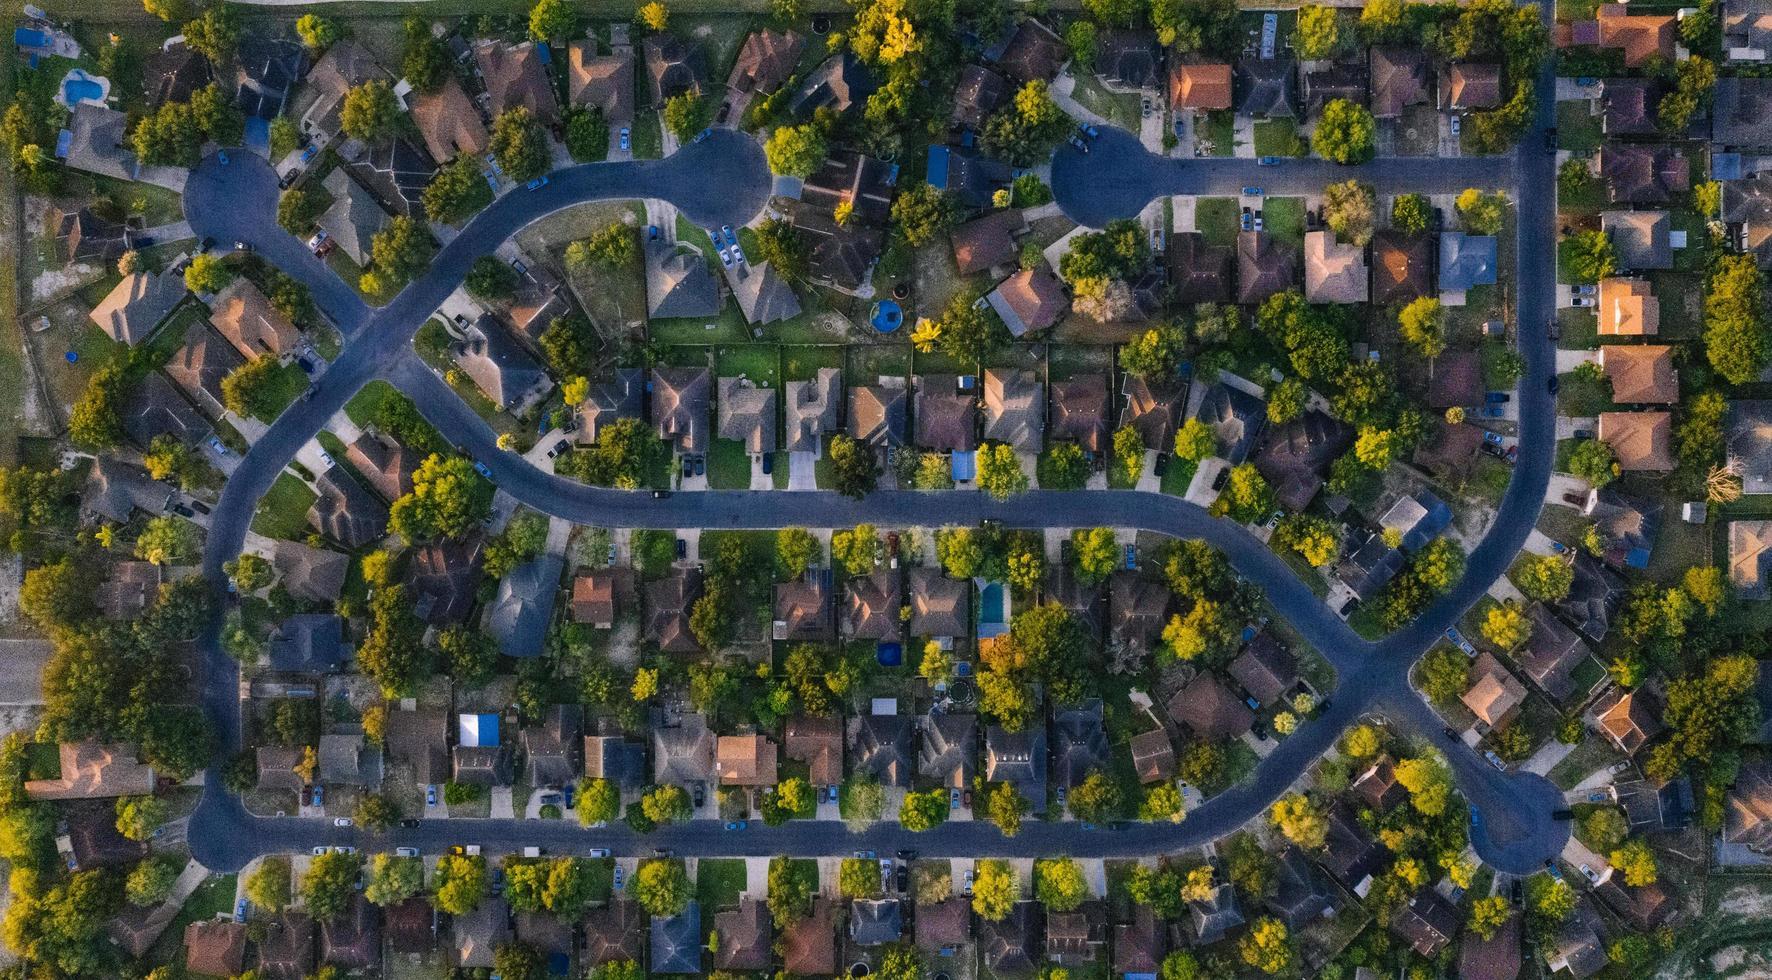 Bird's eye view of houses photo